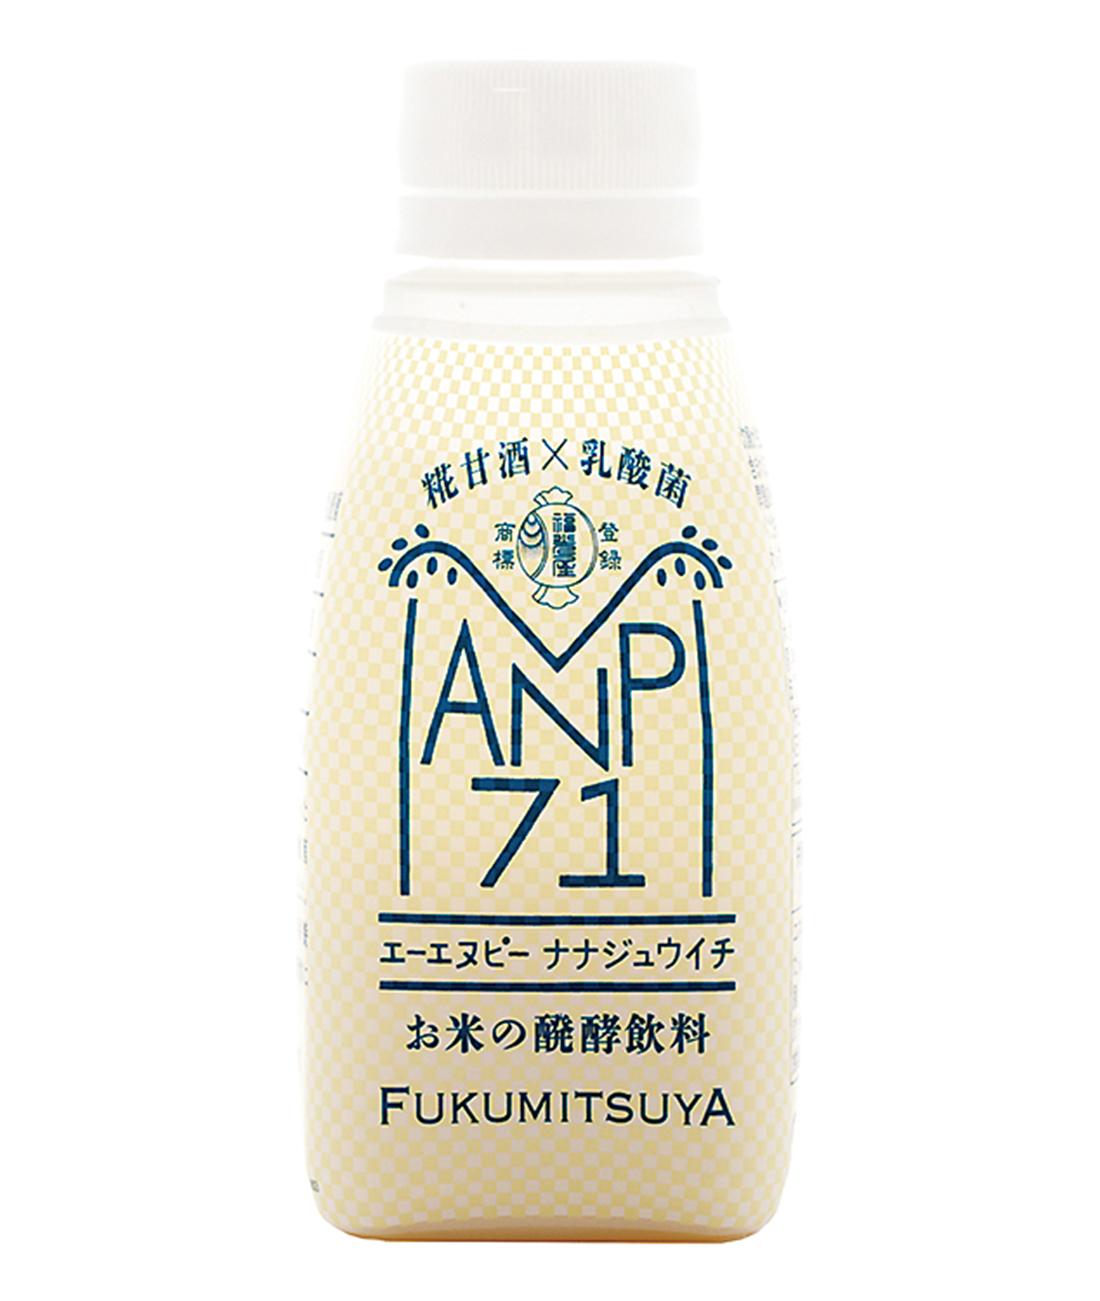 ANP71